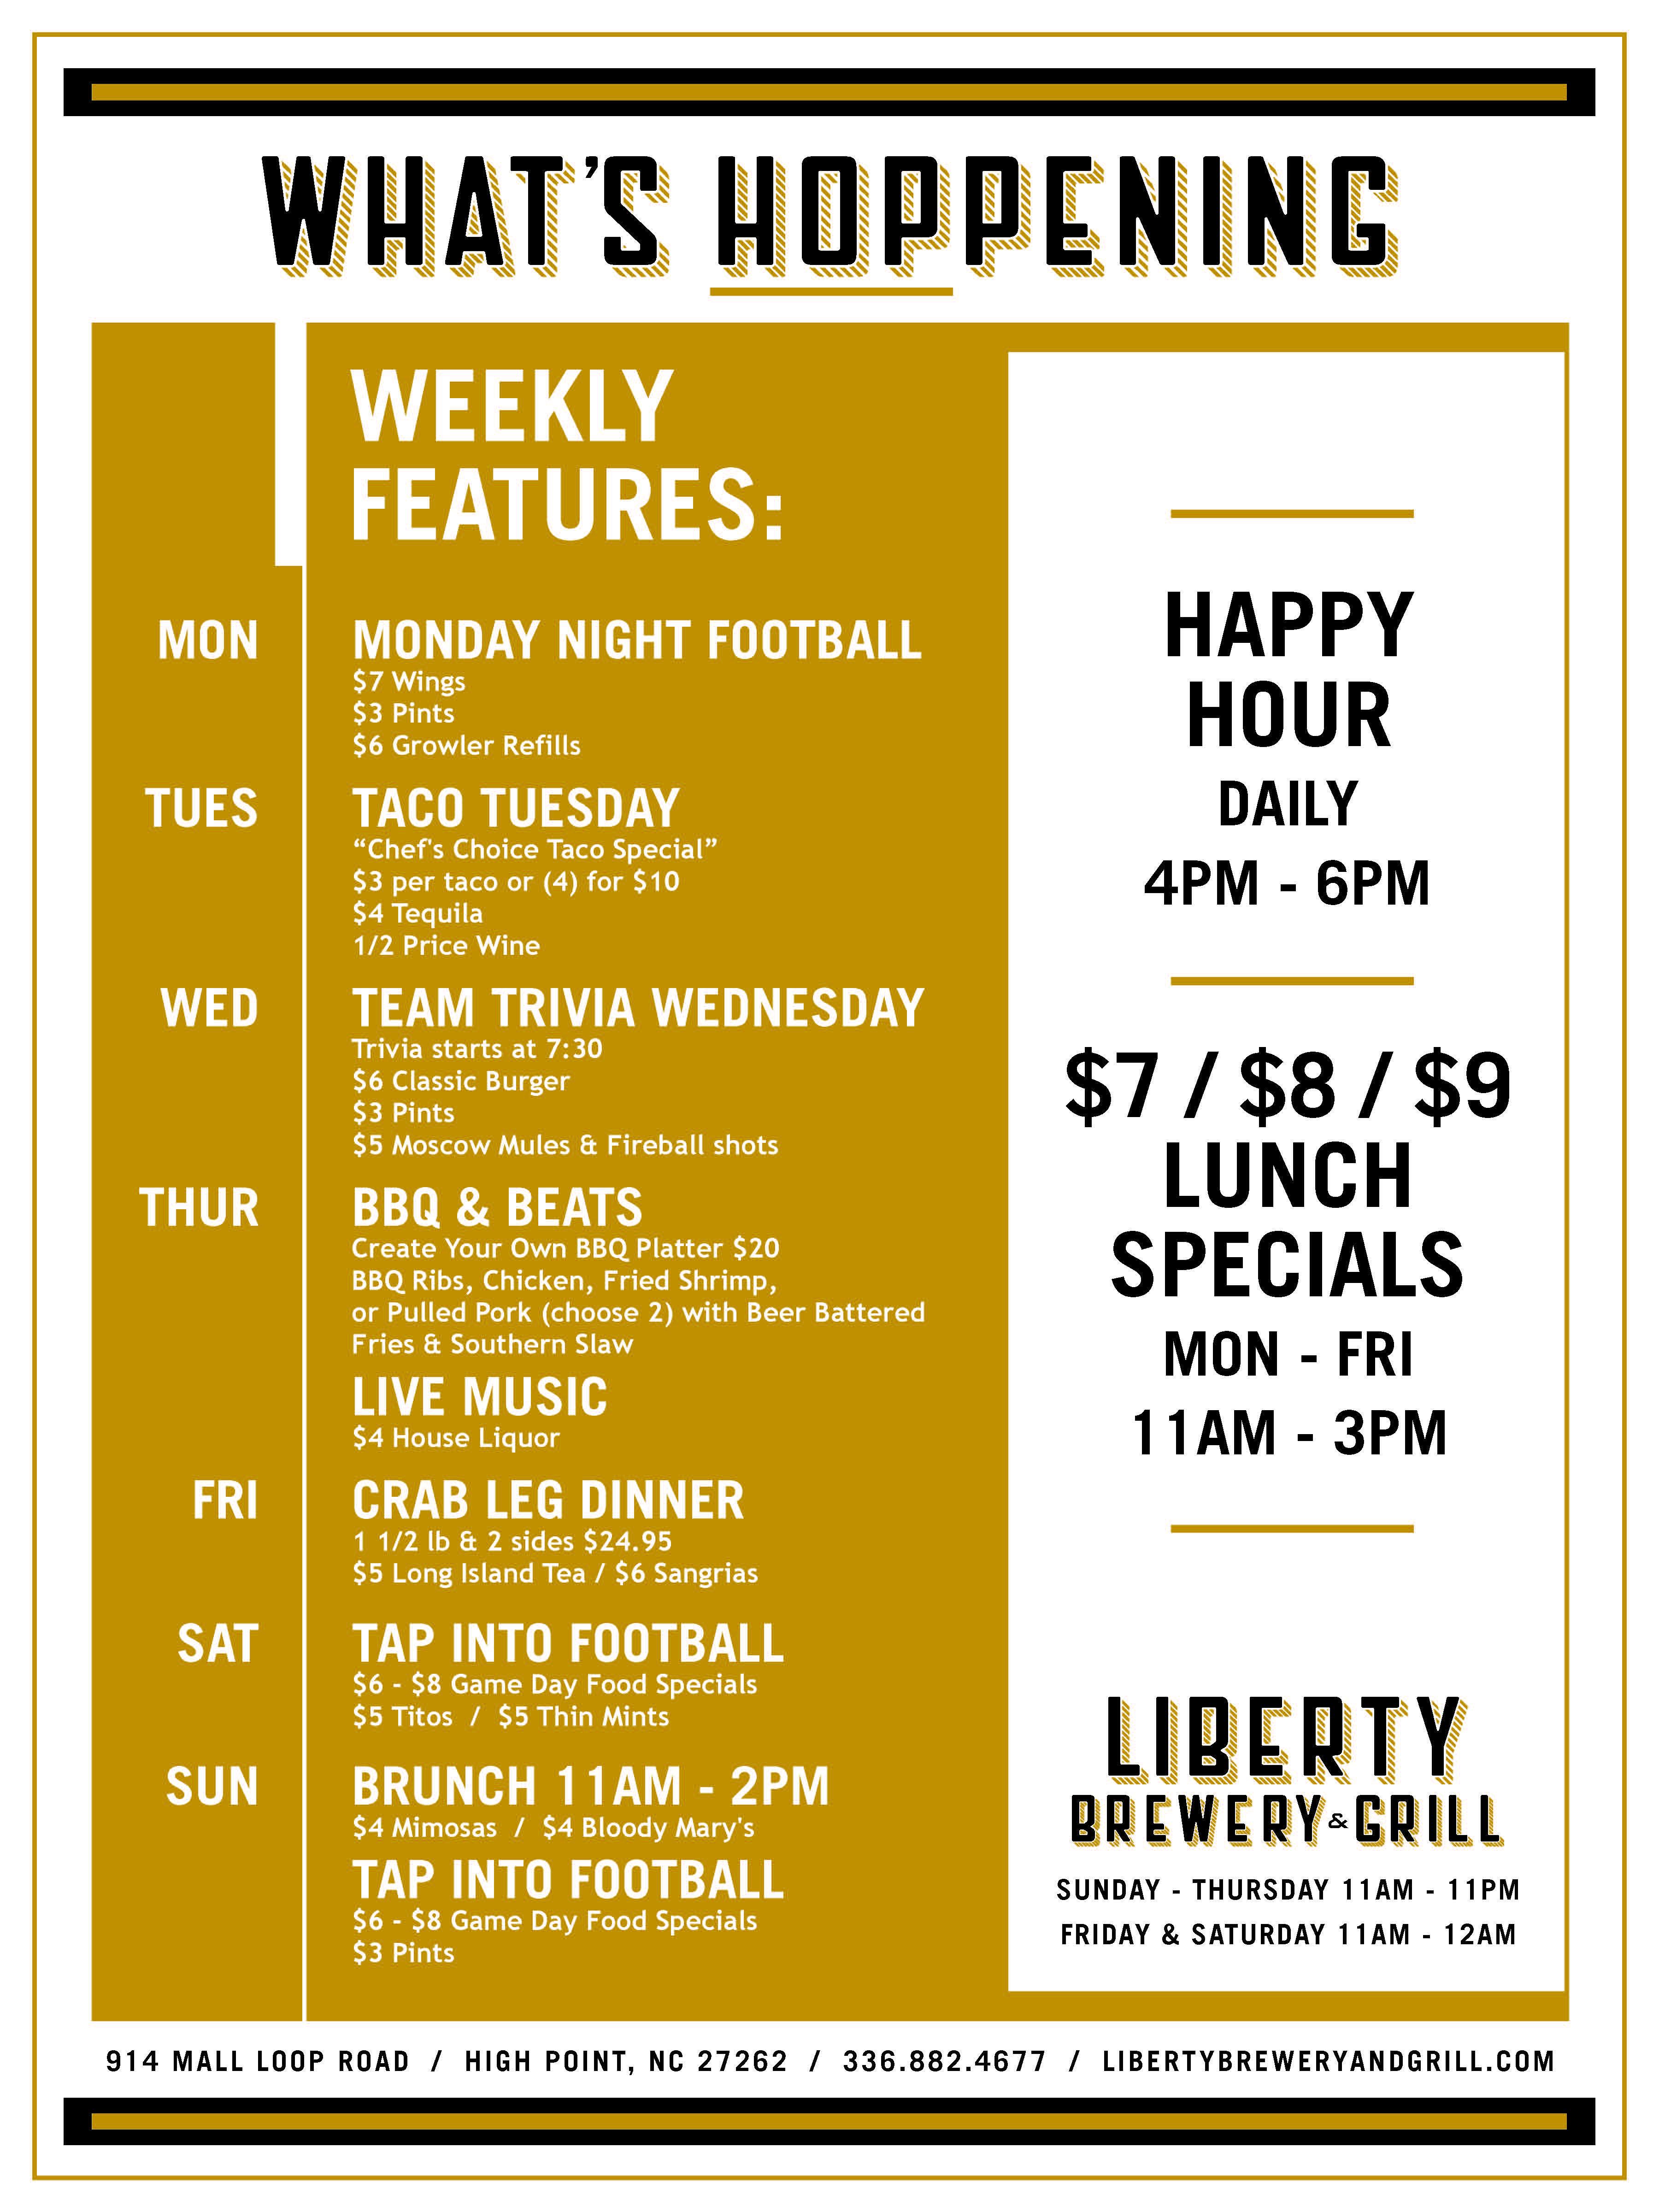 (300) Liberty Brewery High Point Daily Specials Calendar (005).jpg